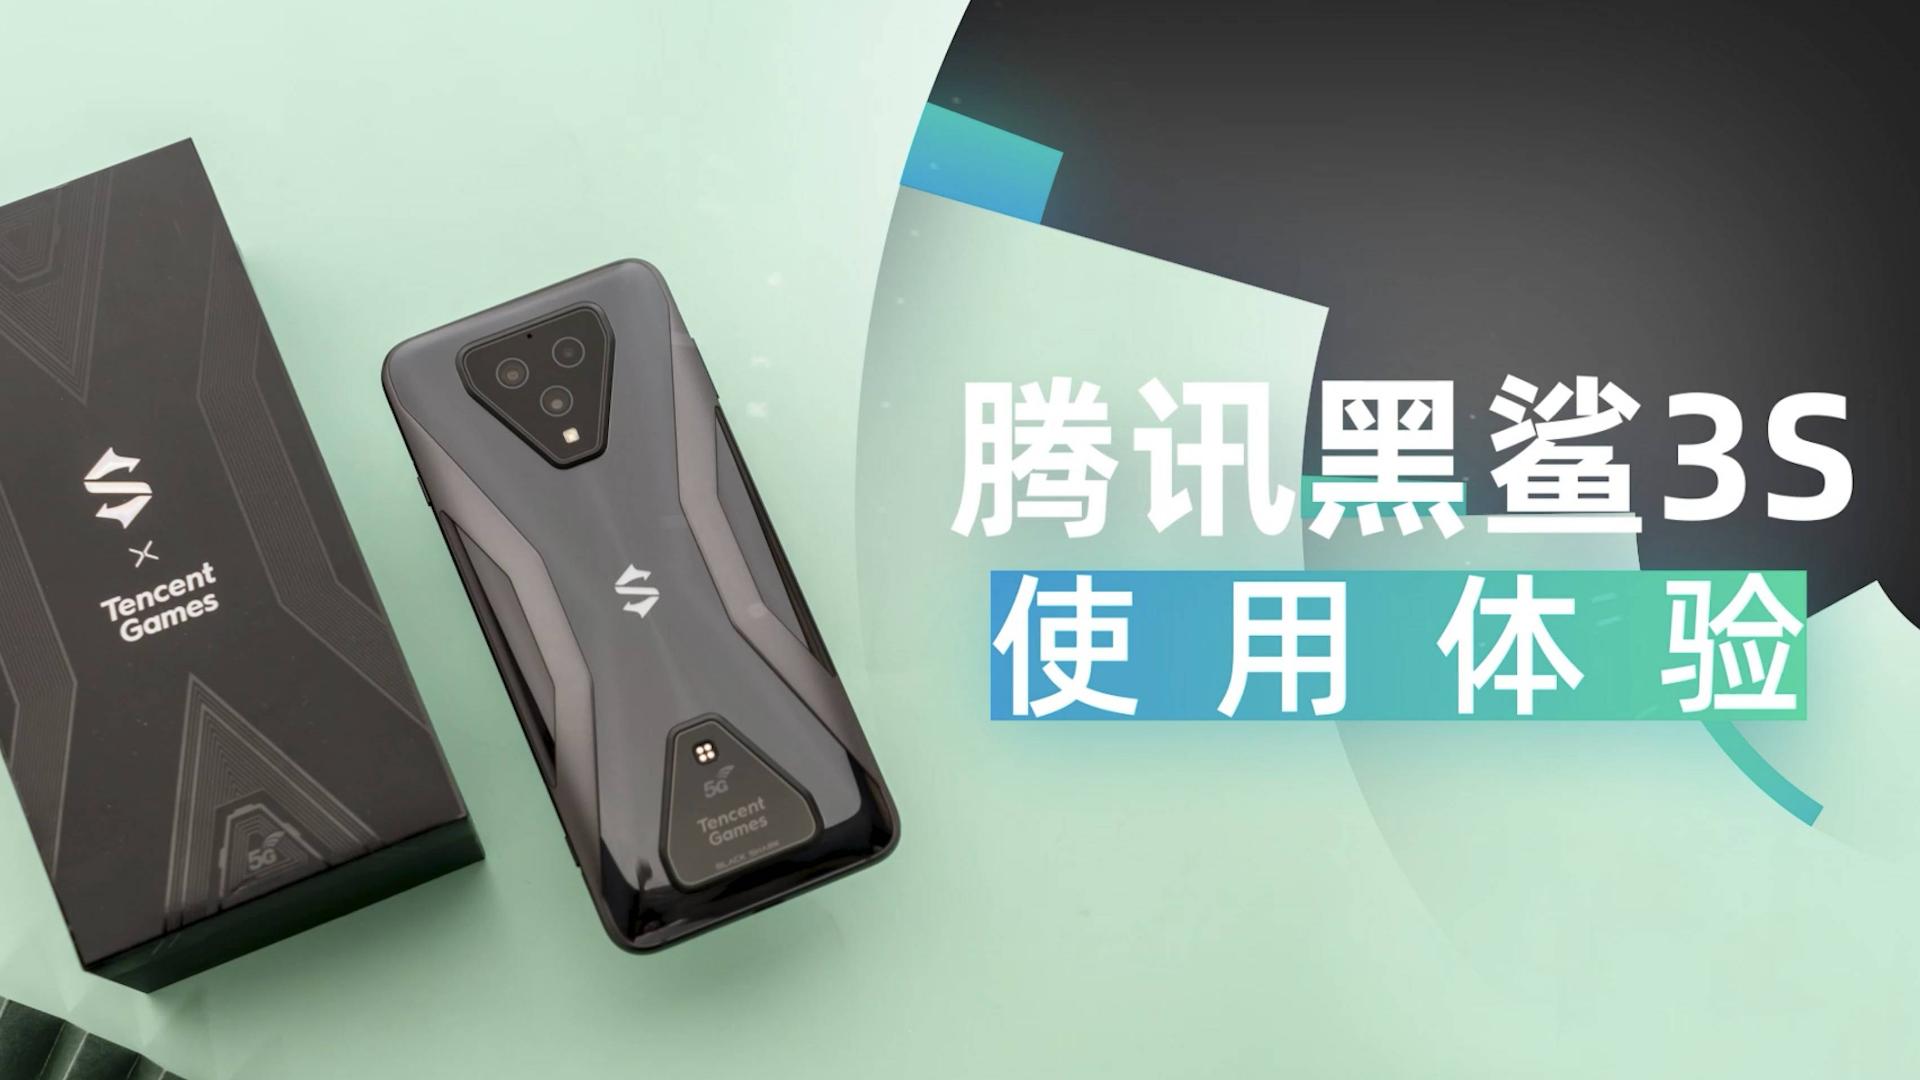 「VDGER」腾讯黑鲨游戏手机3S体验报告:电竞指套+游戏肩键,玩出新花样!